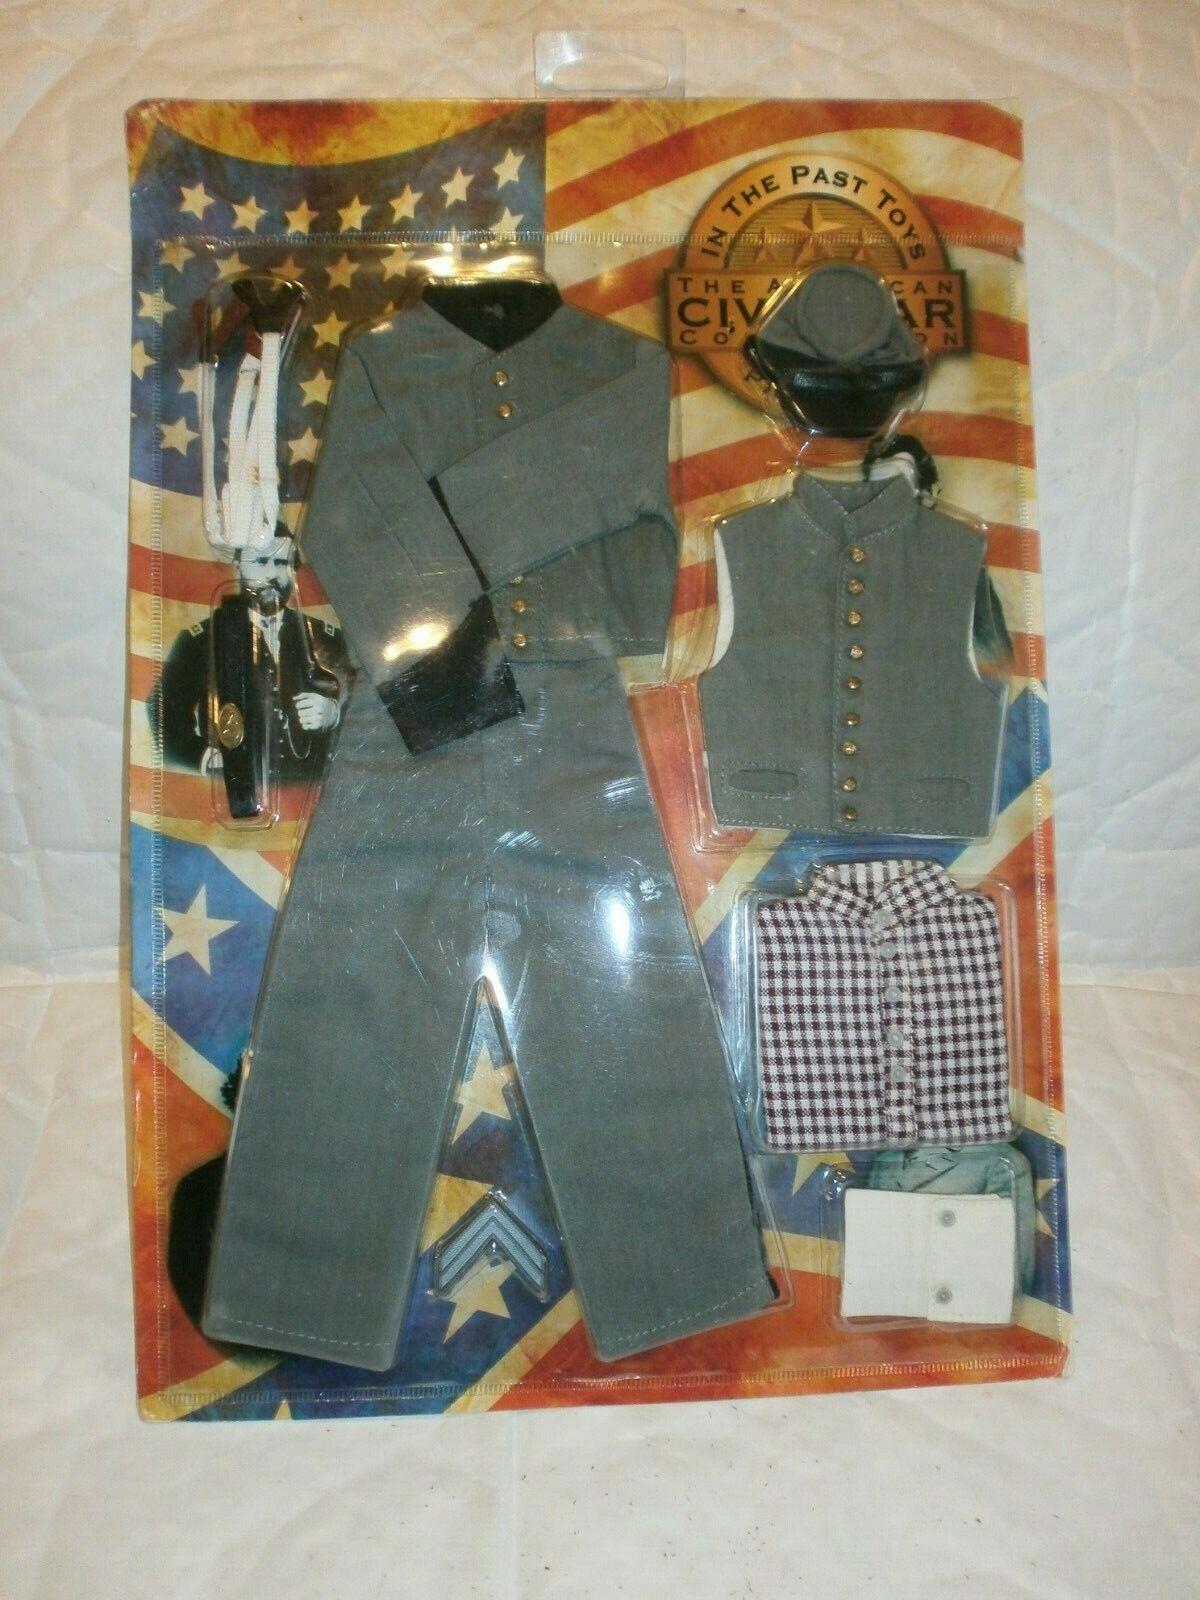 ITPJuguetes ACW Cochedada Outfit (1) escala 1 6th Accesorio De Juguete